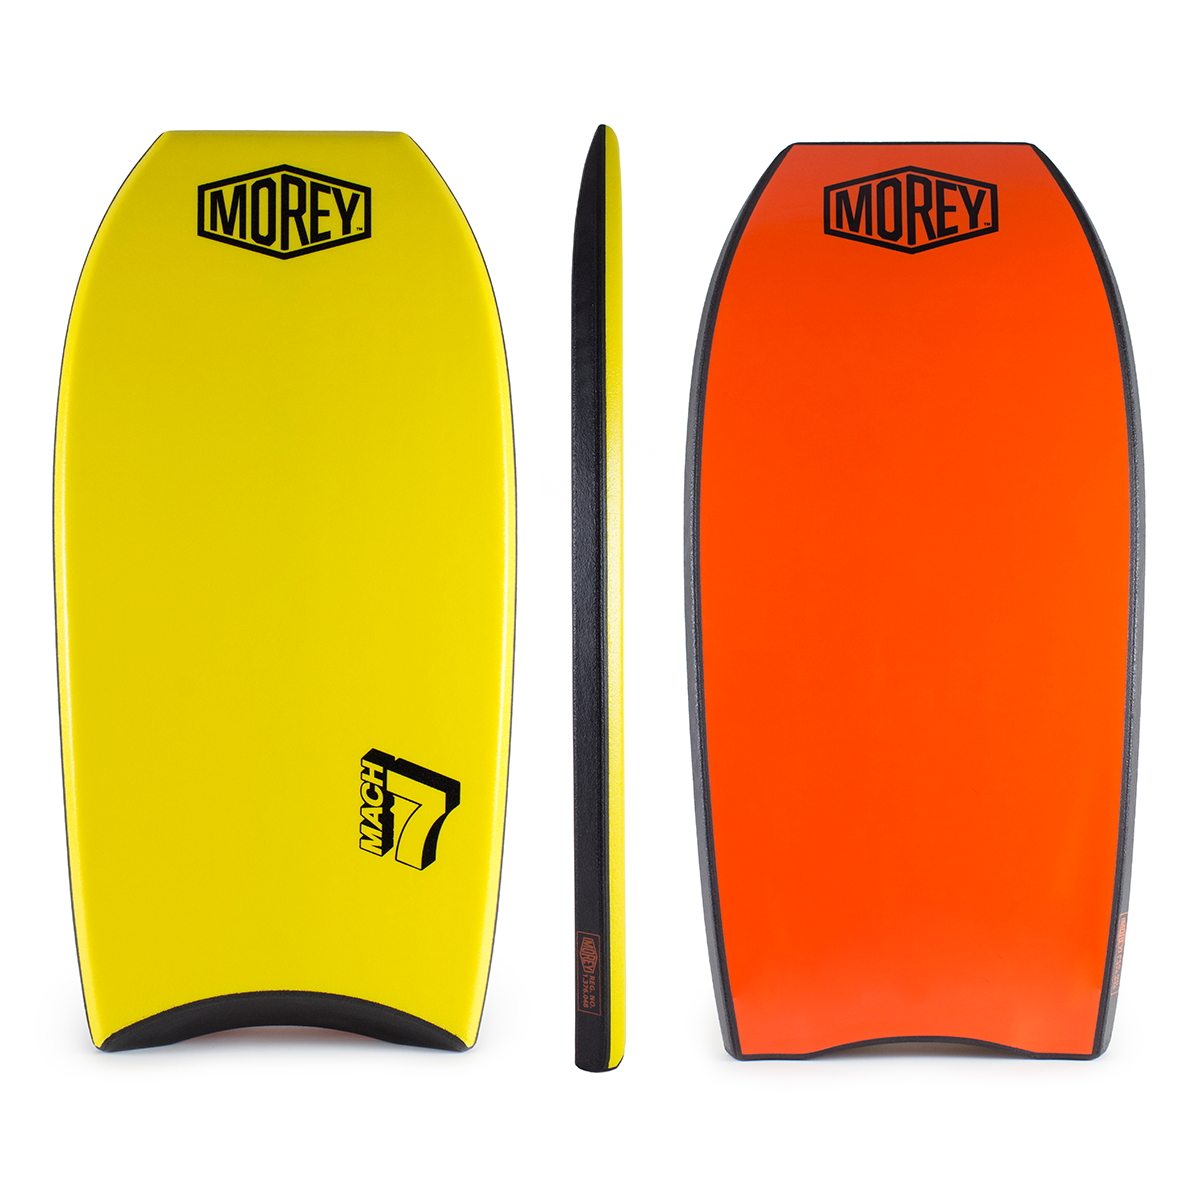 Morey Bodyboard Mach 7 Dual Power Rod Stringers PE Core